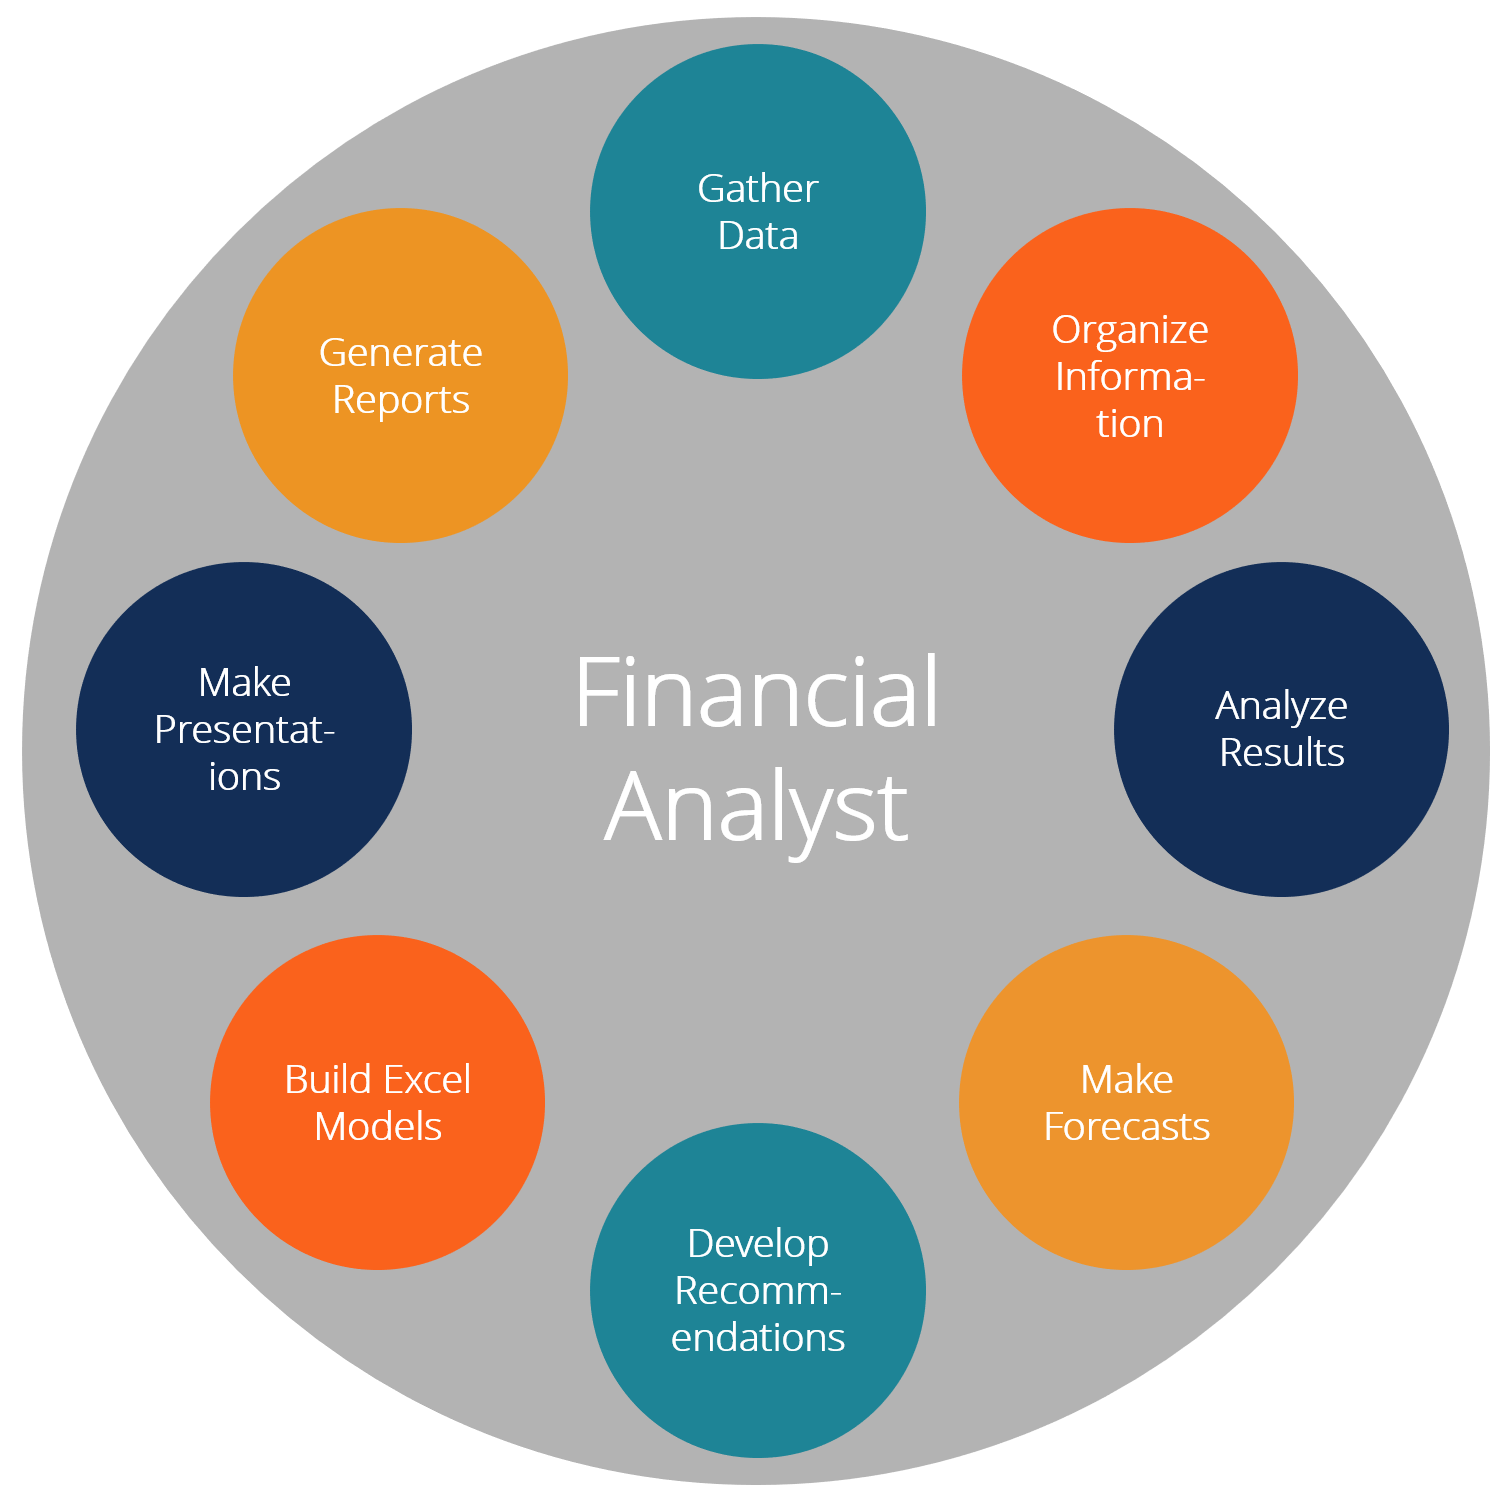 Jobs Description: Duties And Responsibilities In Details - Financial Analyst Jobs Near Me